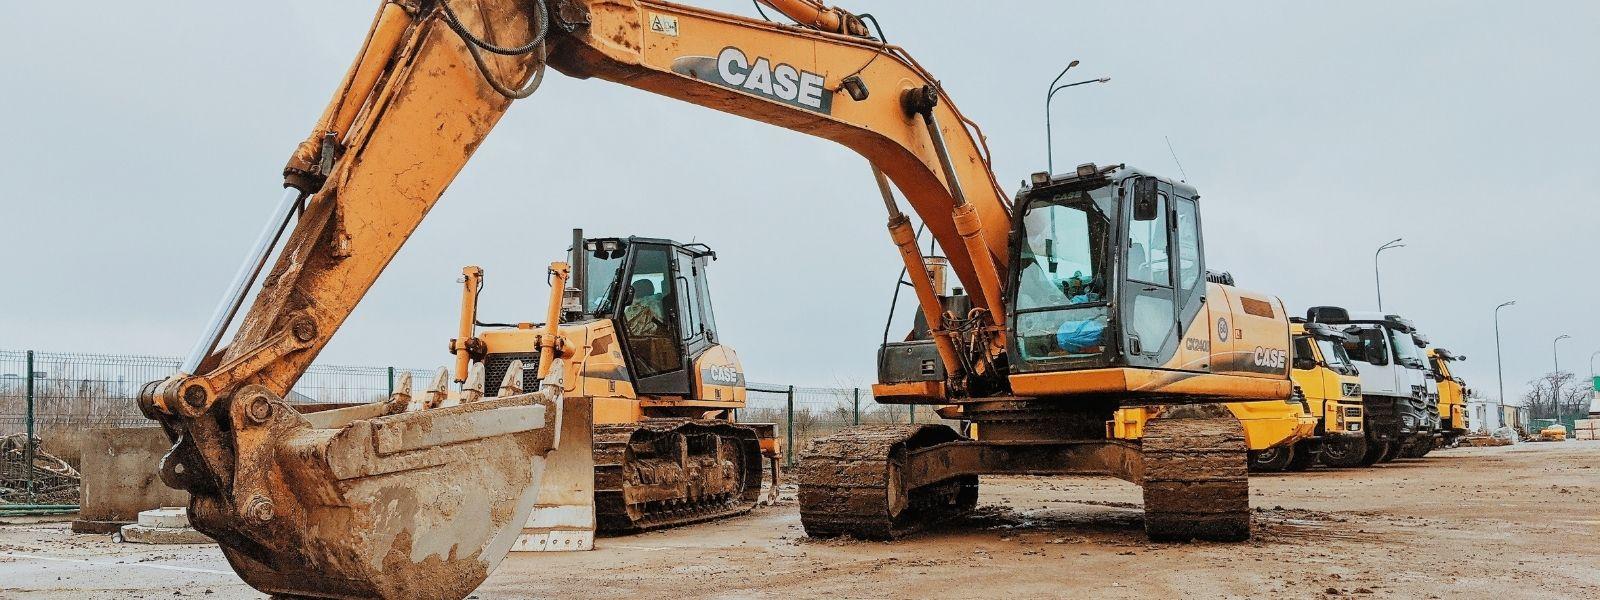 digger at building site